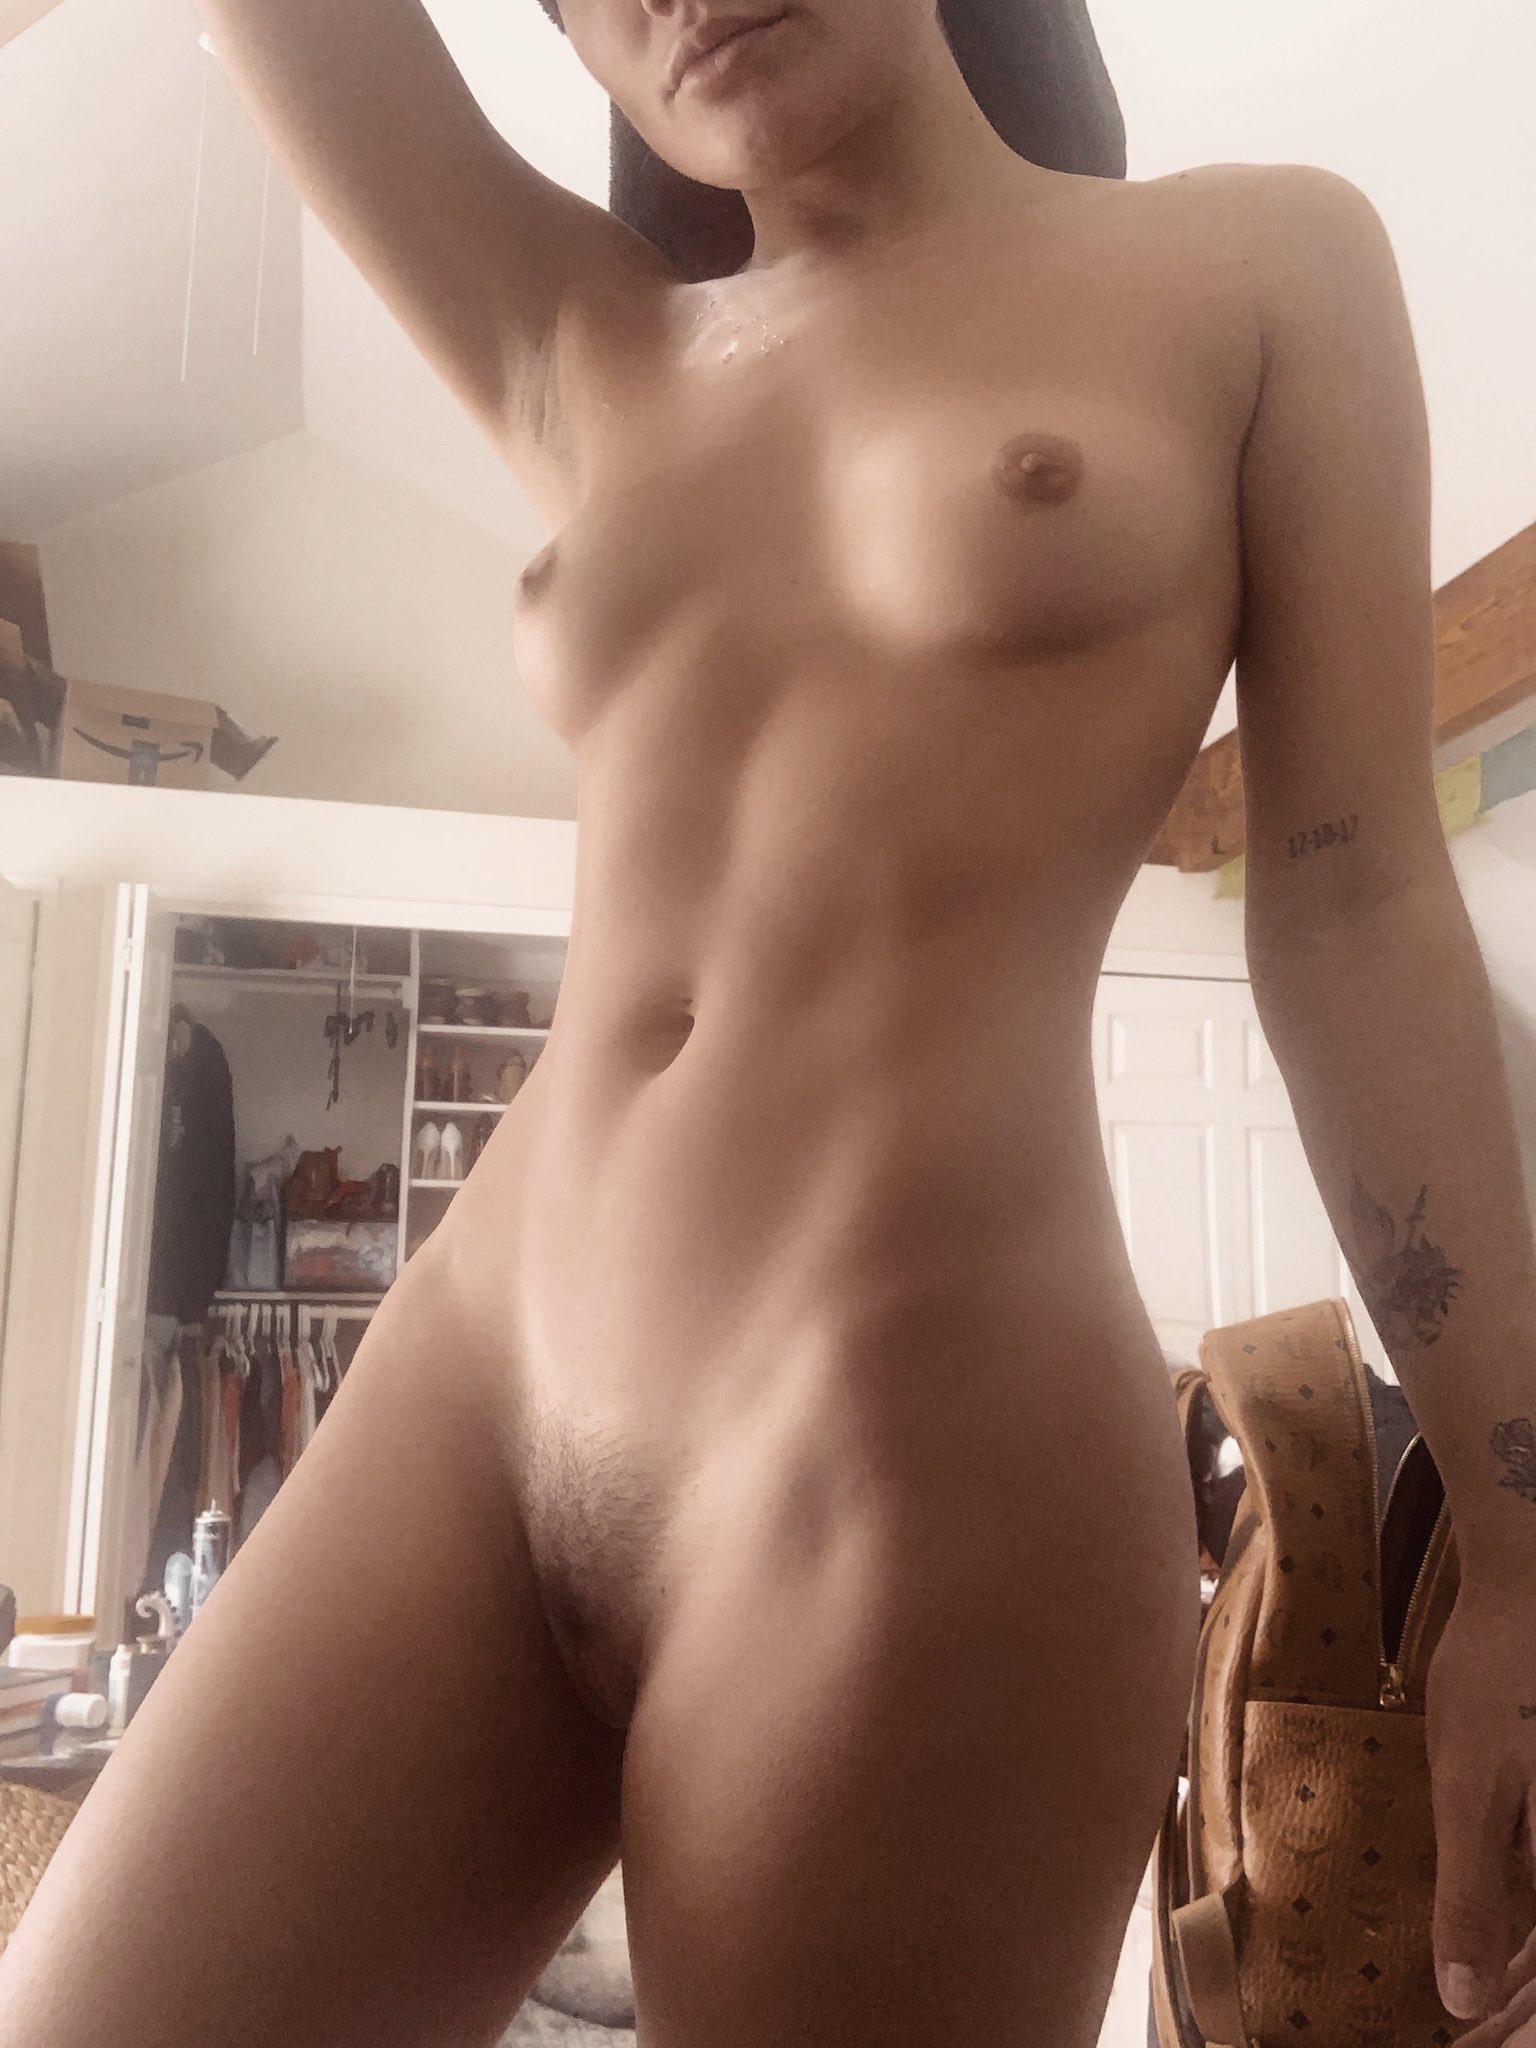 Wonderful Body